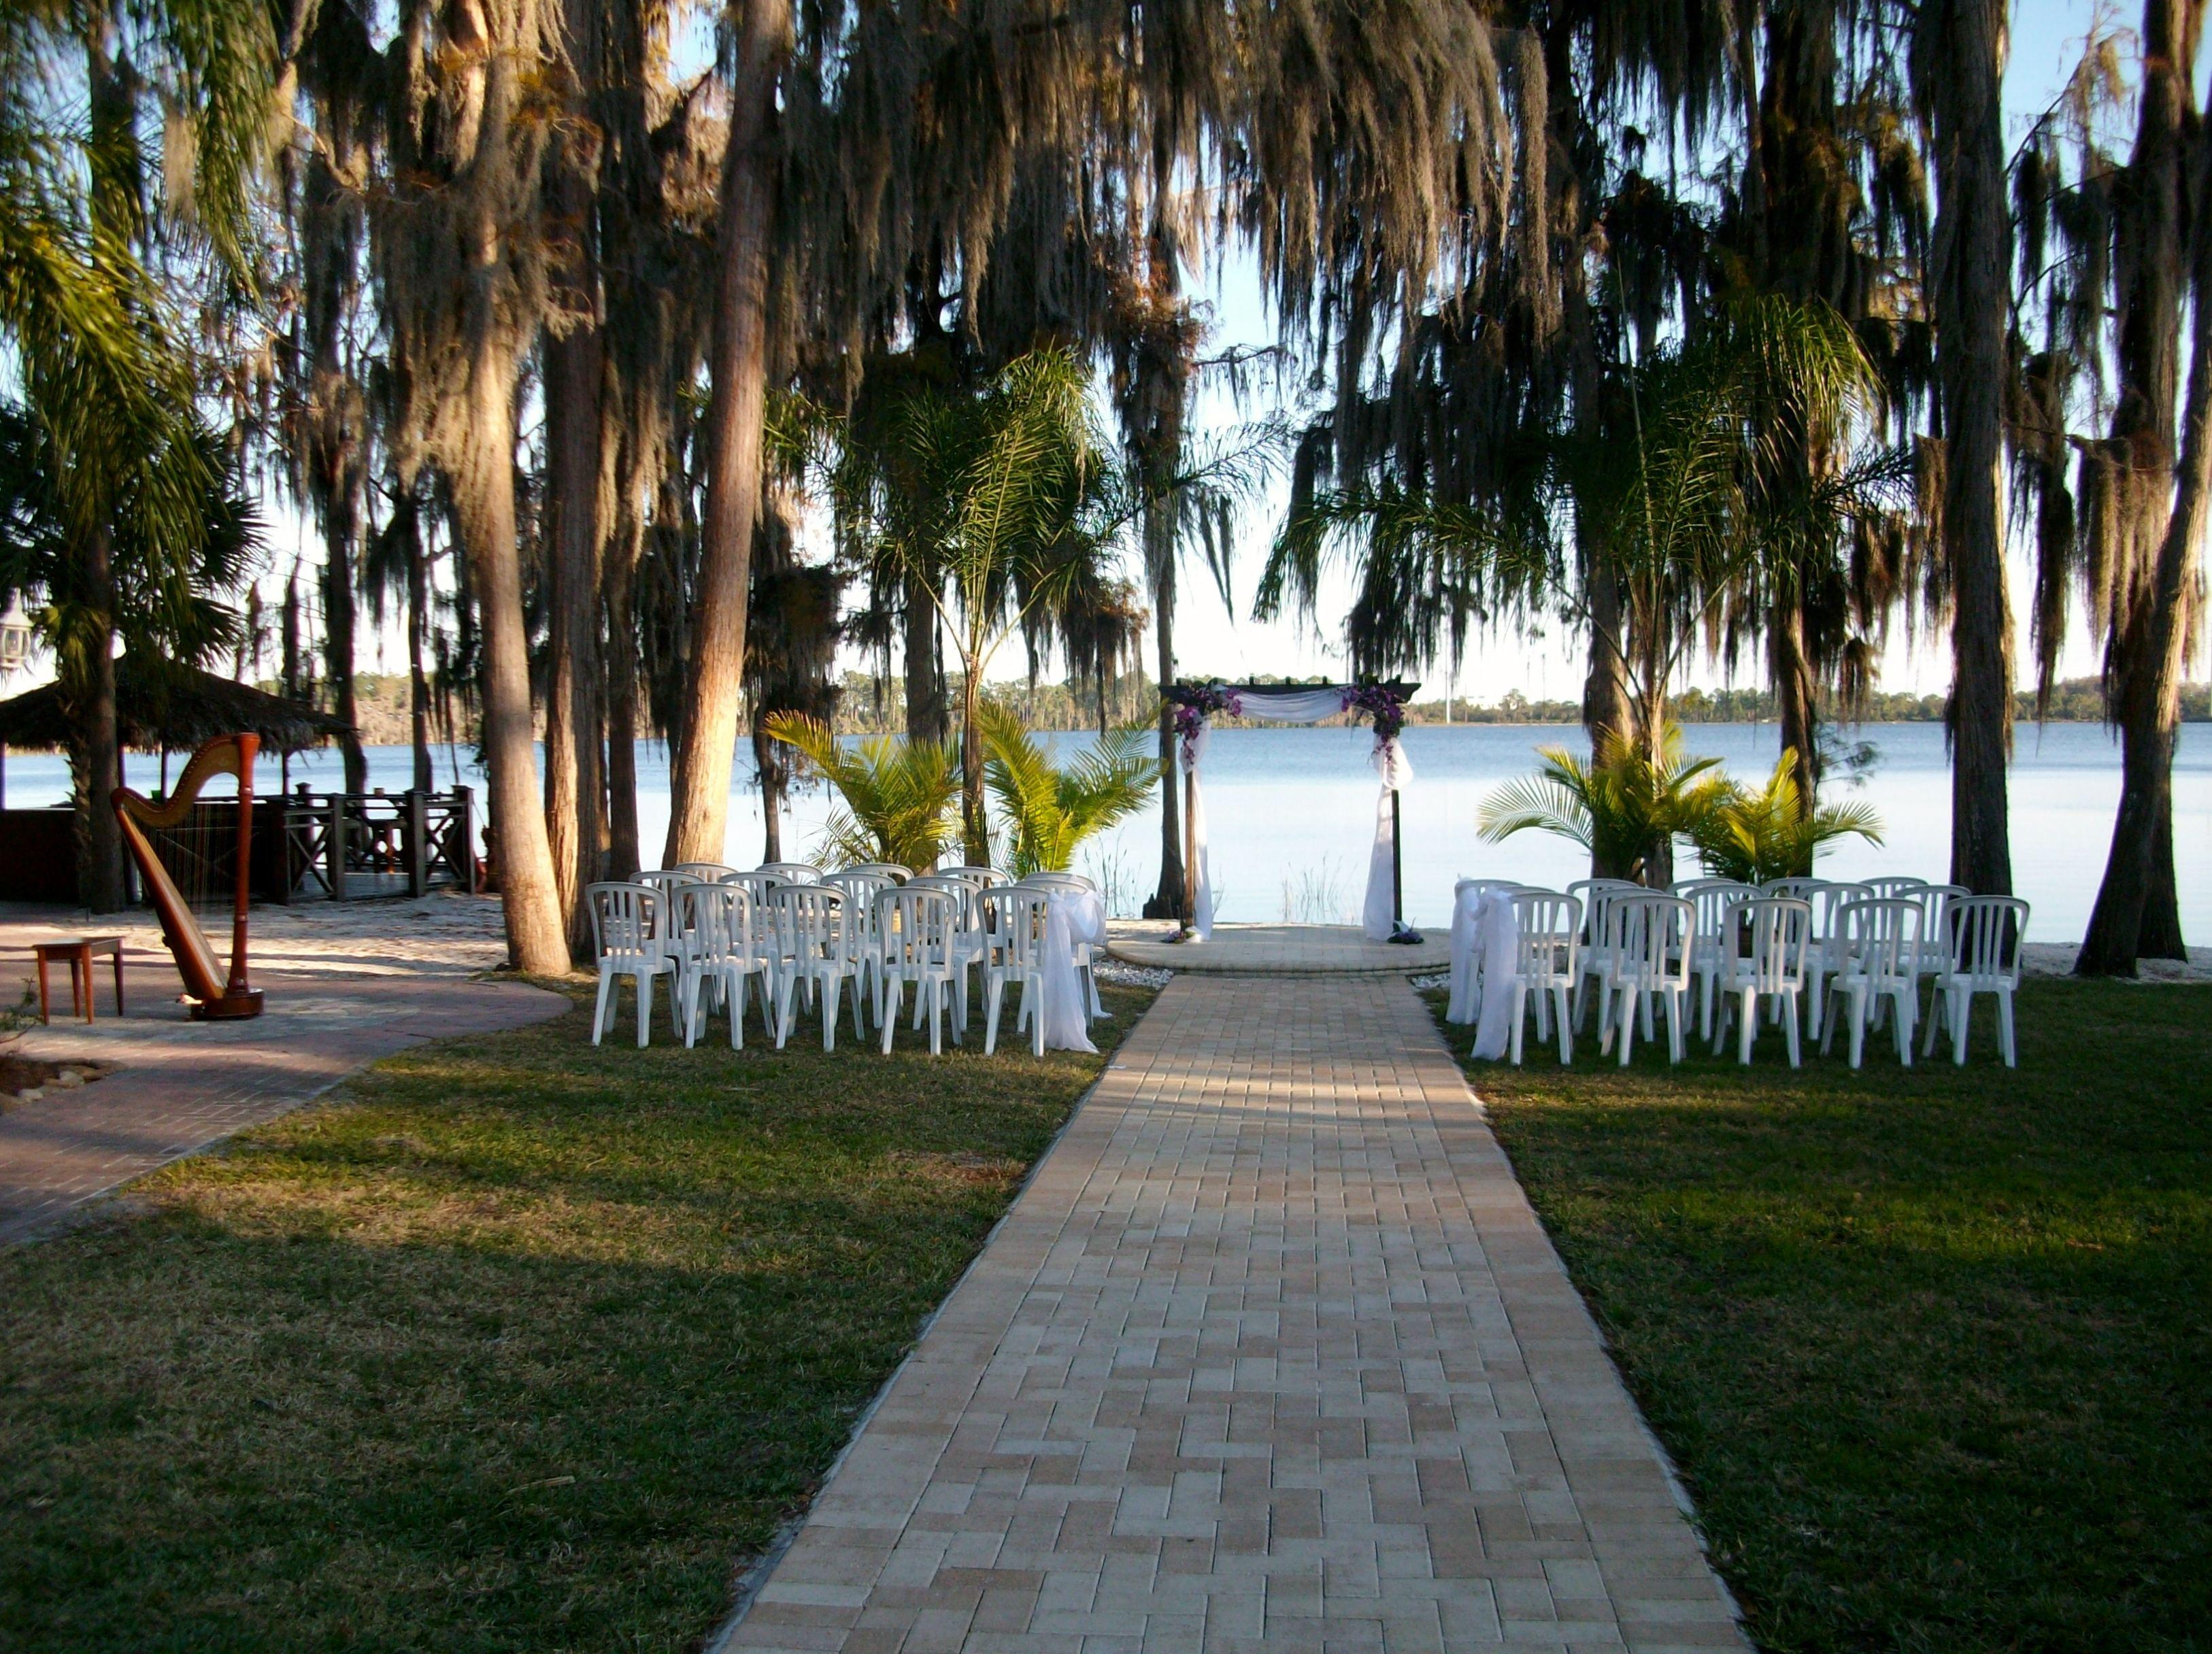 Paradise Cove Wedding Ceremony In Orlando Near Disney World This Is A Pretty Location